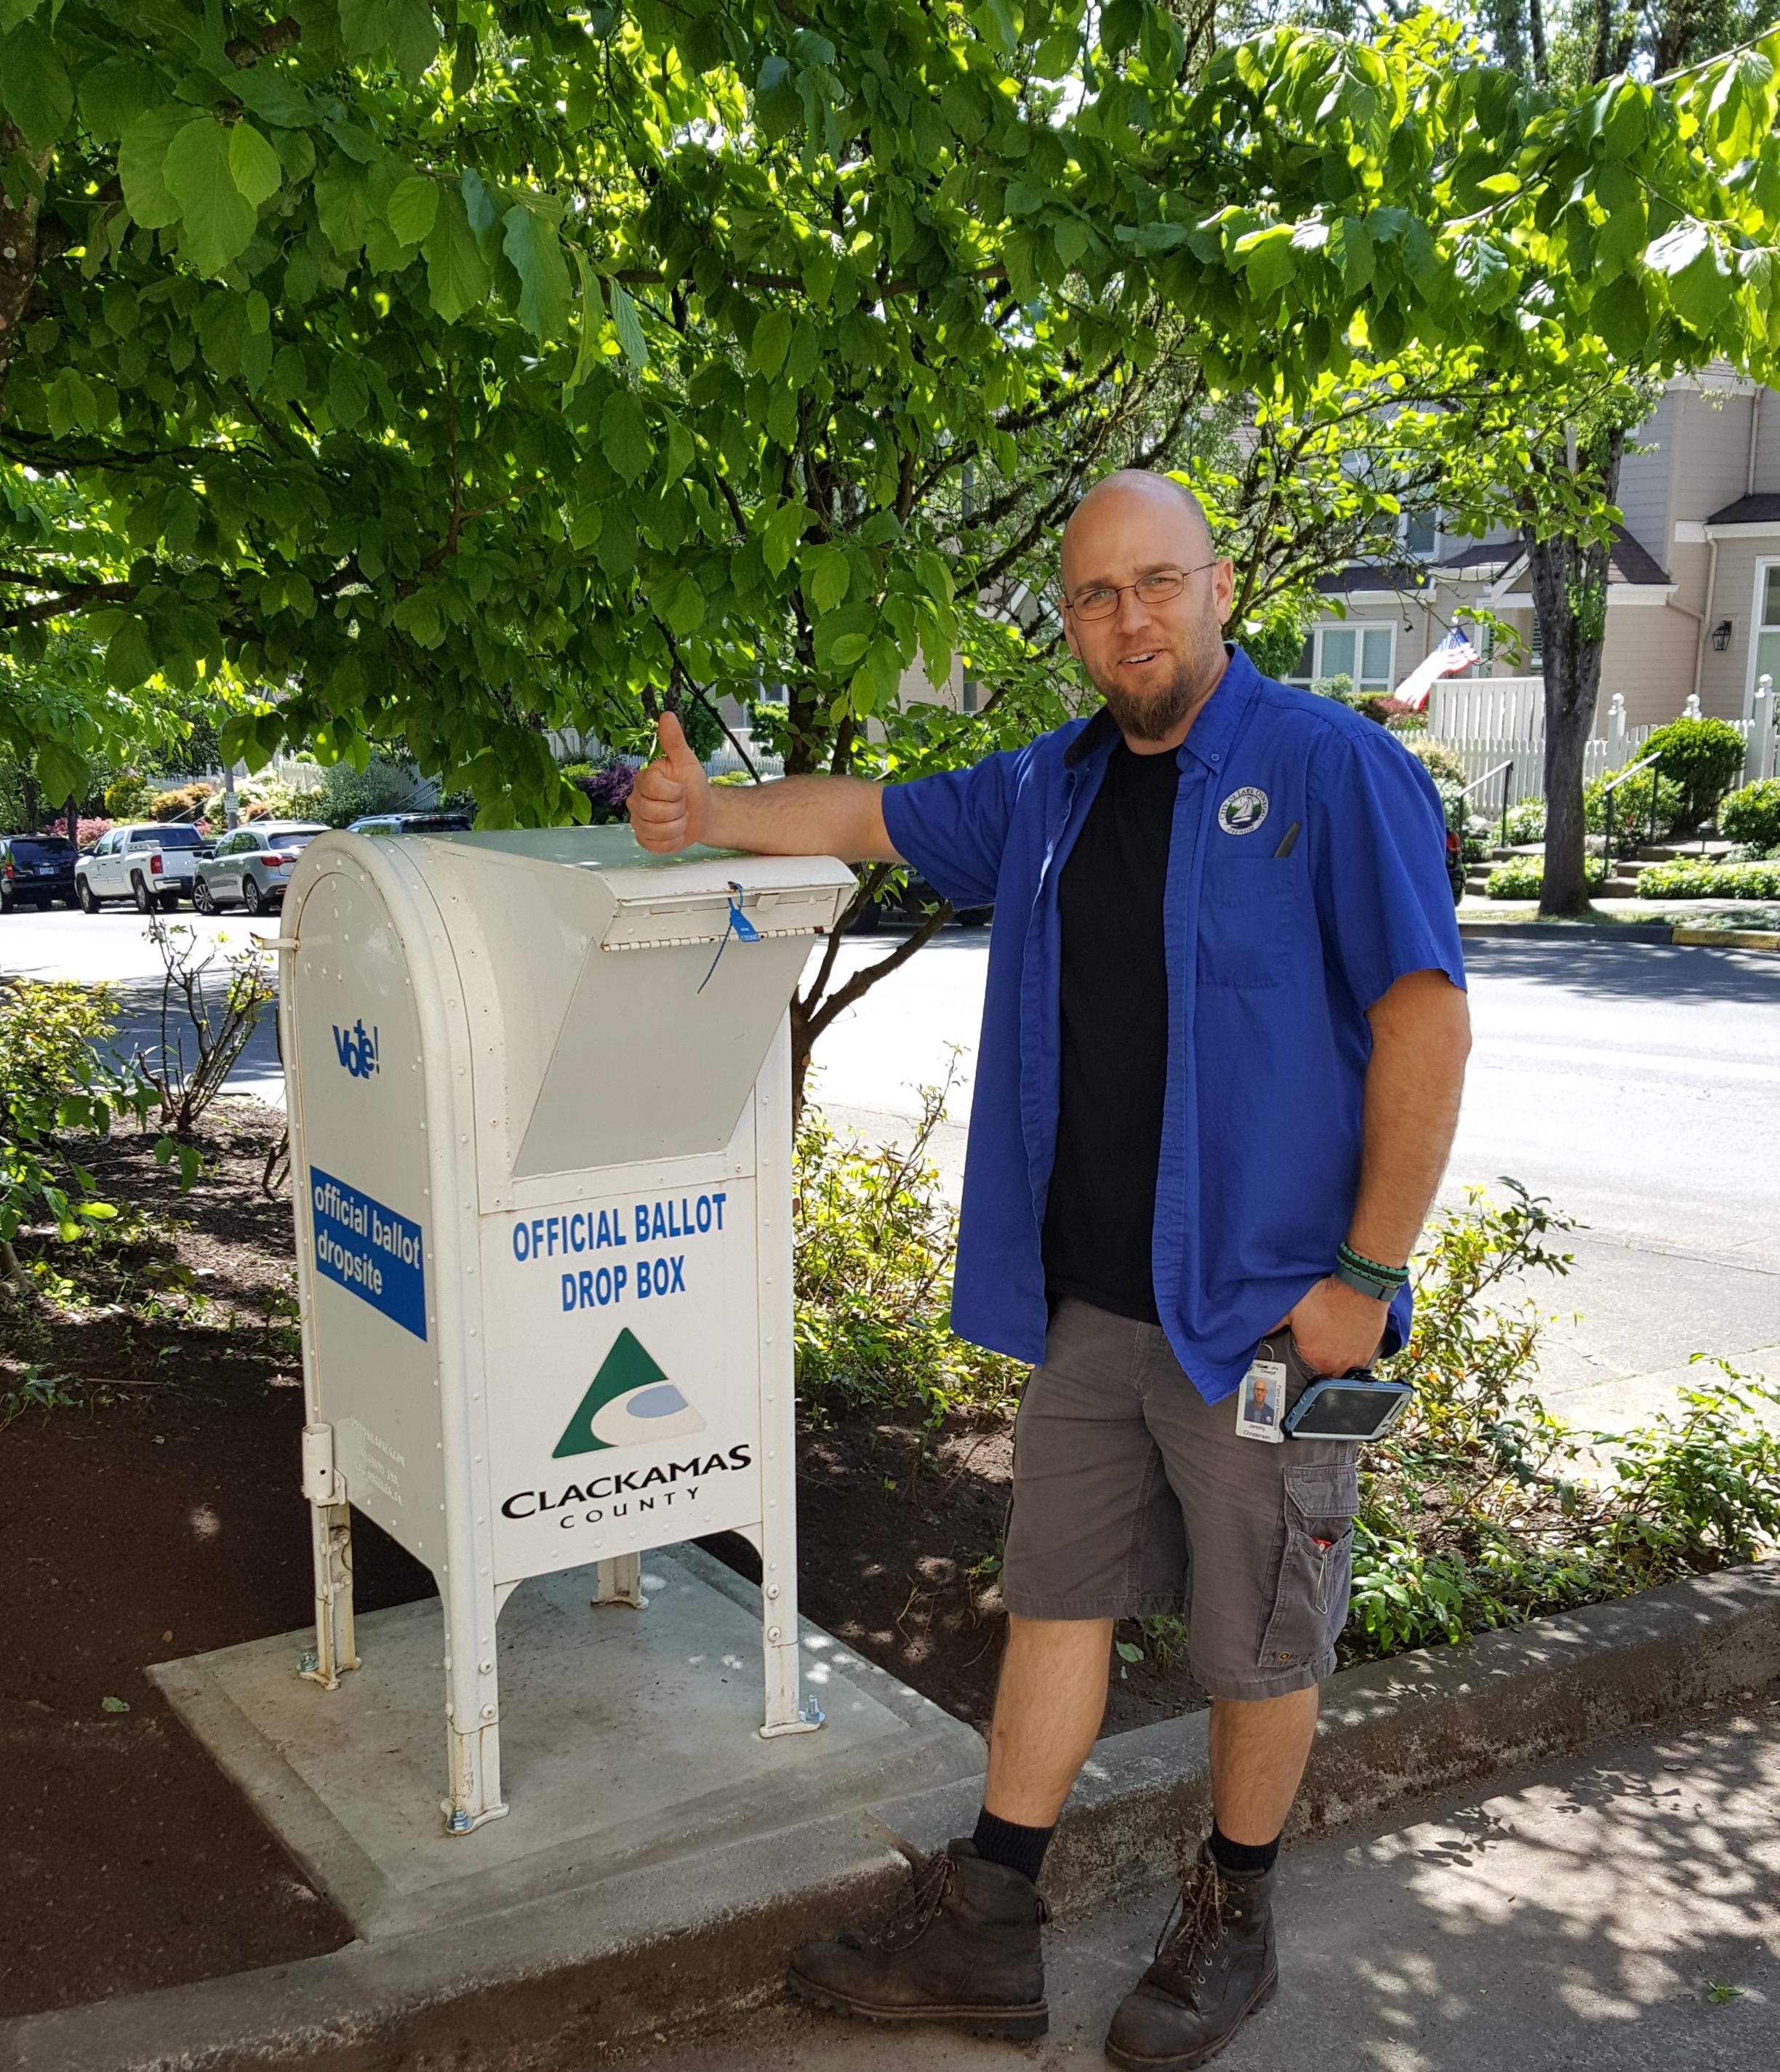 Lake Oswego City Hall Hosts New Ballot Drop Box